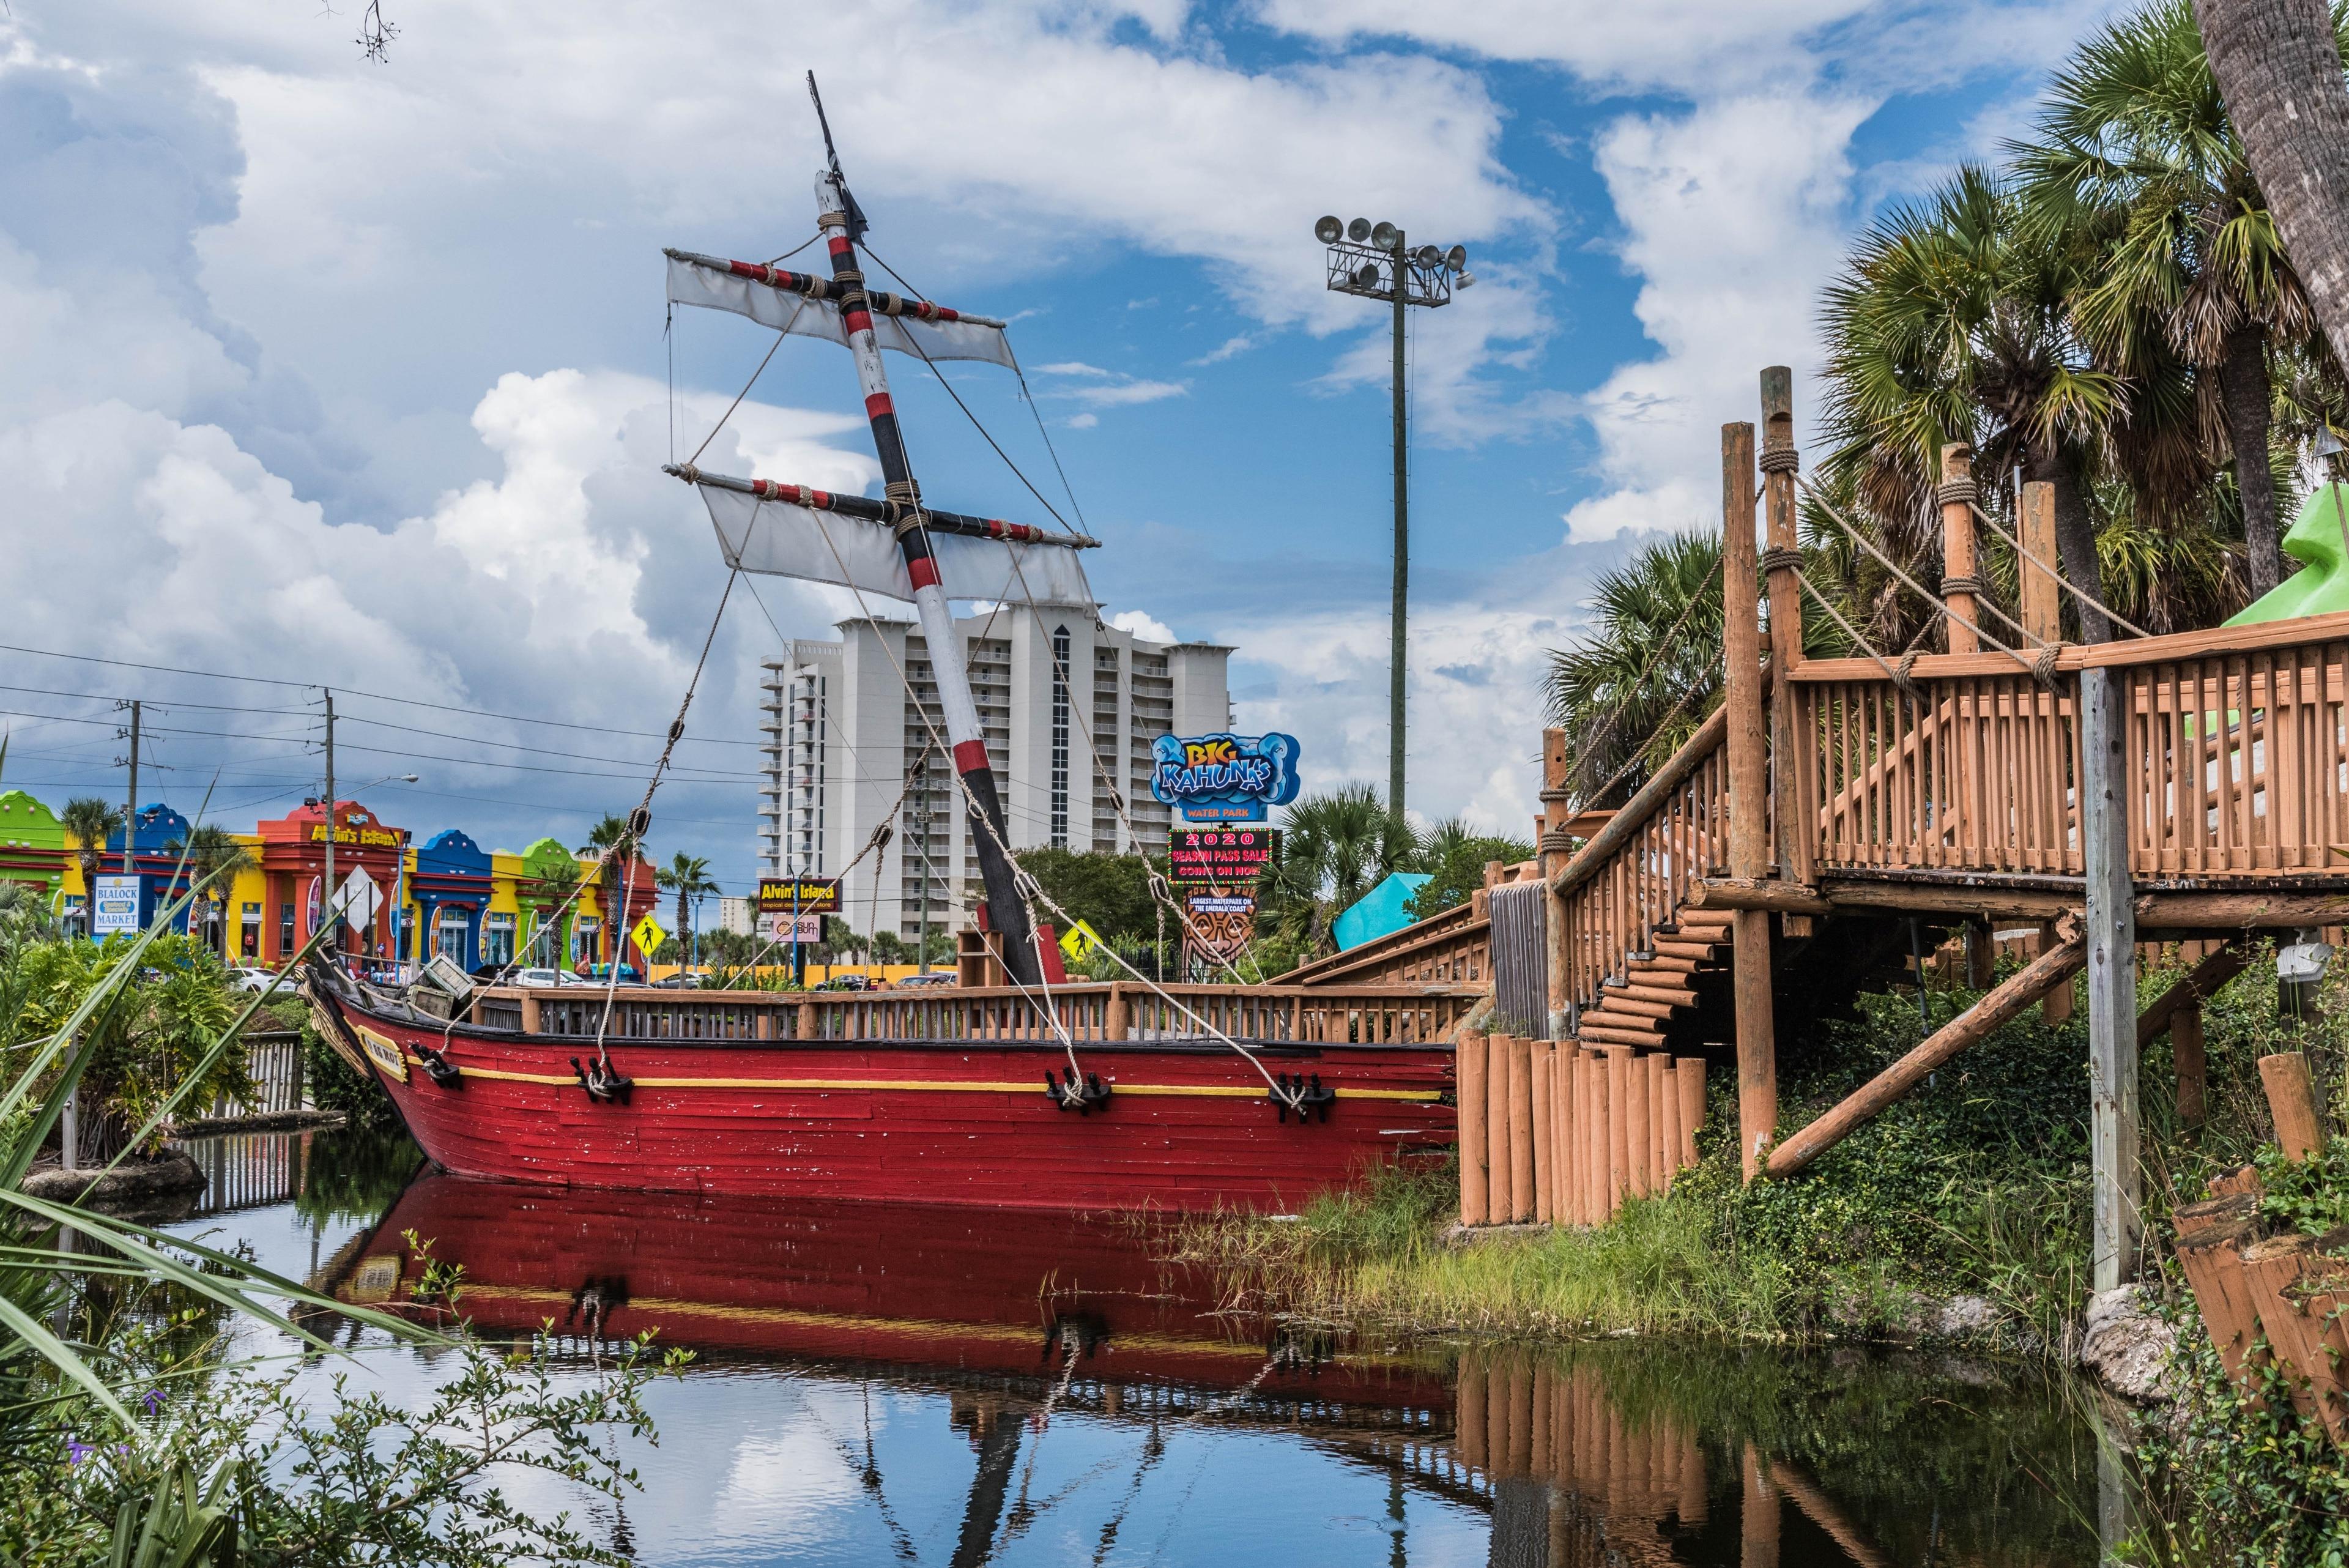 Big Kahuna's Water and Adventure Park, Destin, Florida, United States of America